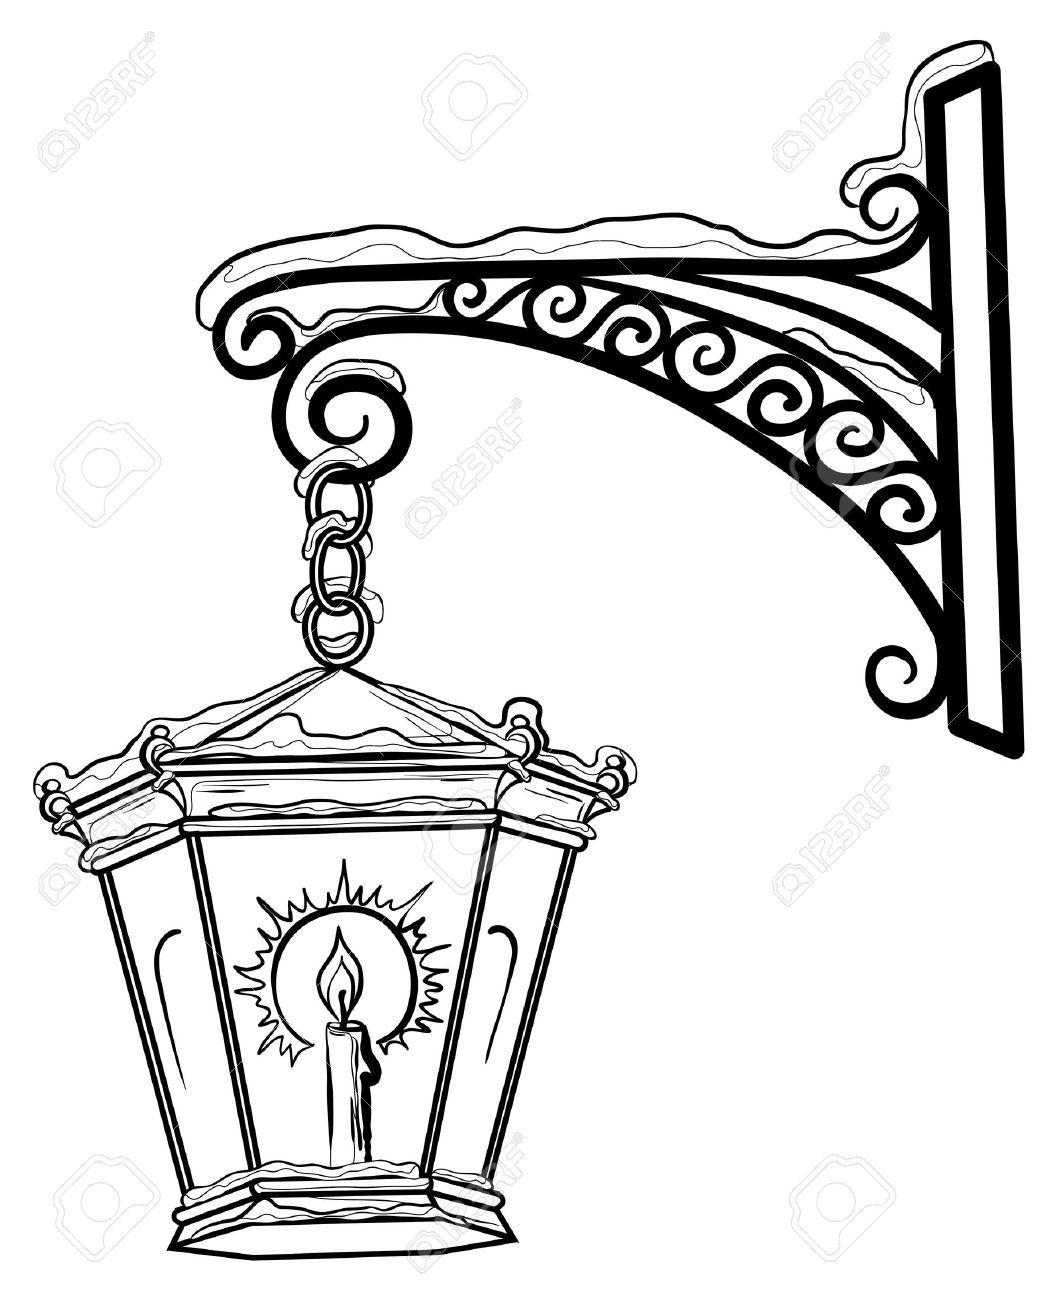 Lamp Drawing Easy : drawing, Street, Stock, Illustrations,, Cliparts, Royalty, Vectors, Lamp,, Drawings, Sketches, Simple,, Lantern, Drawing